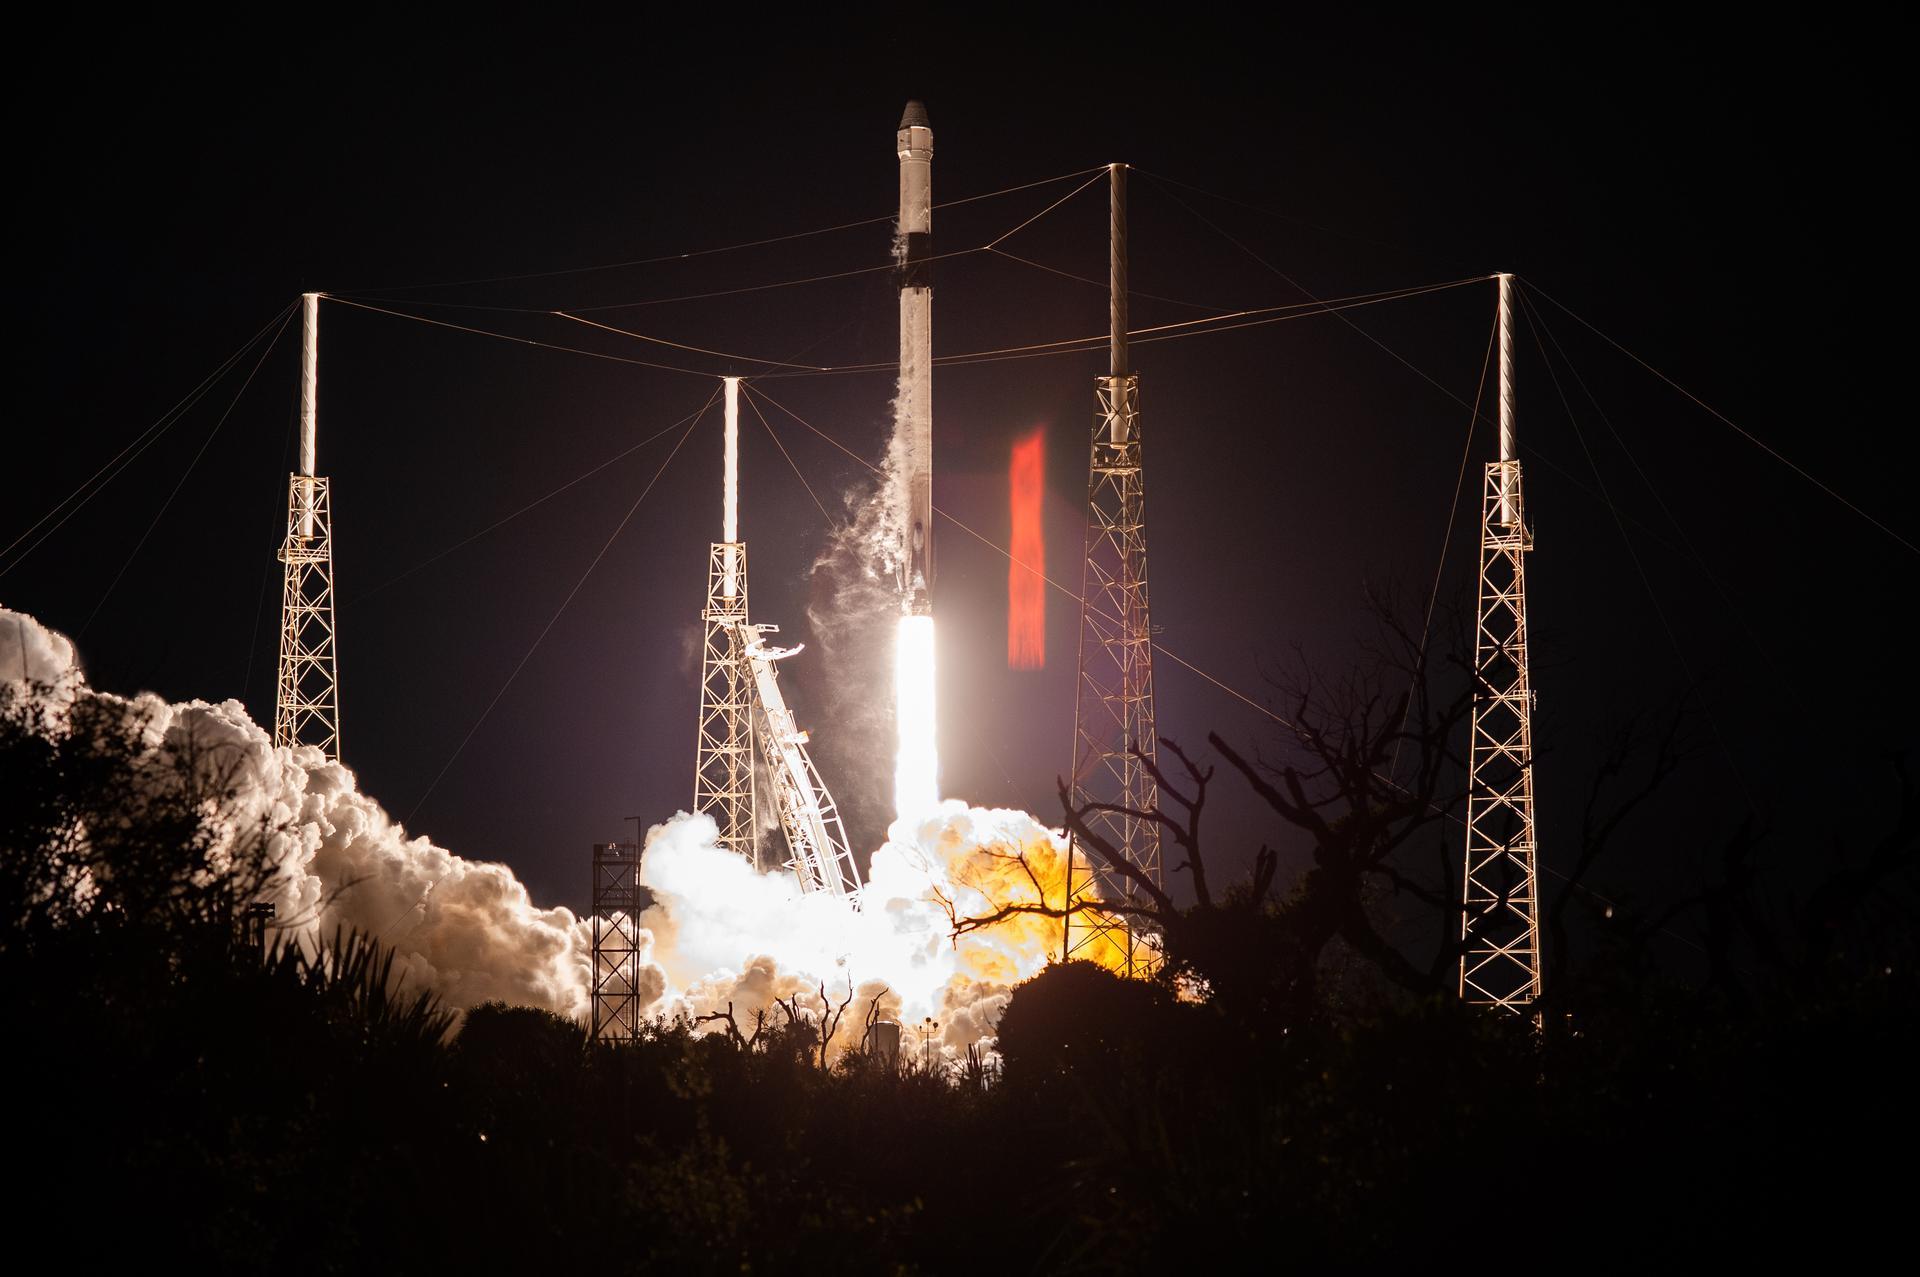 CRS-20 liftoff